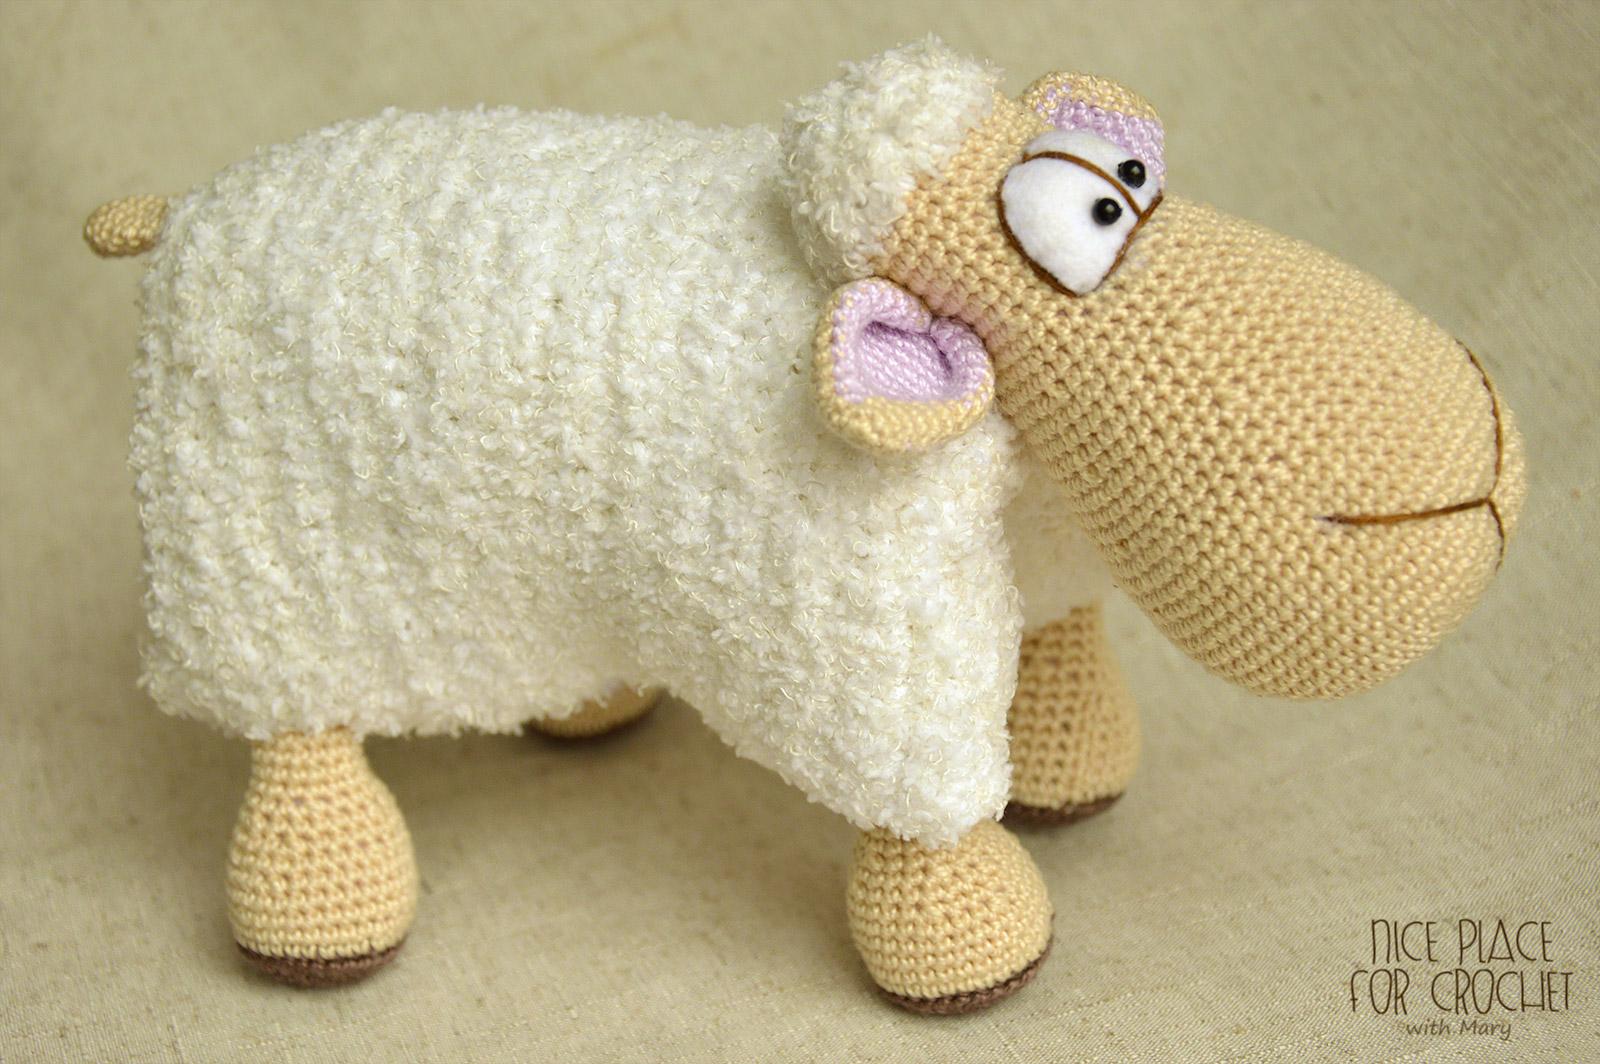 Nice Place For Crochet овечка к новому году готова